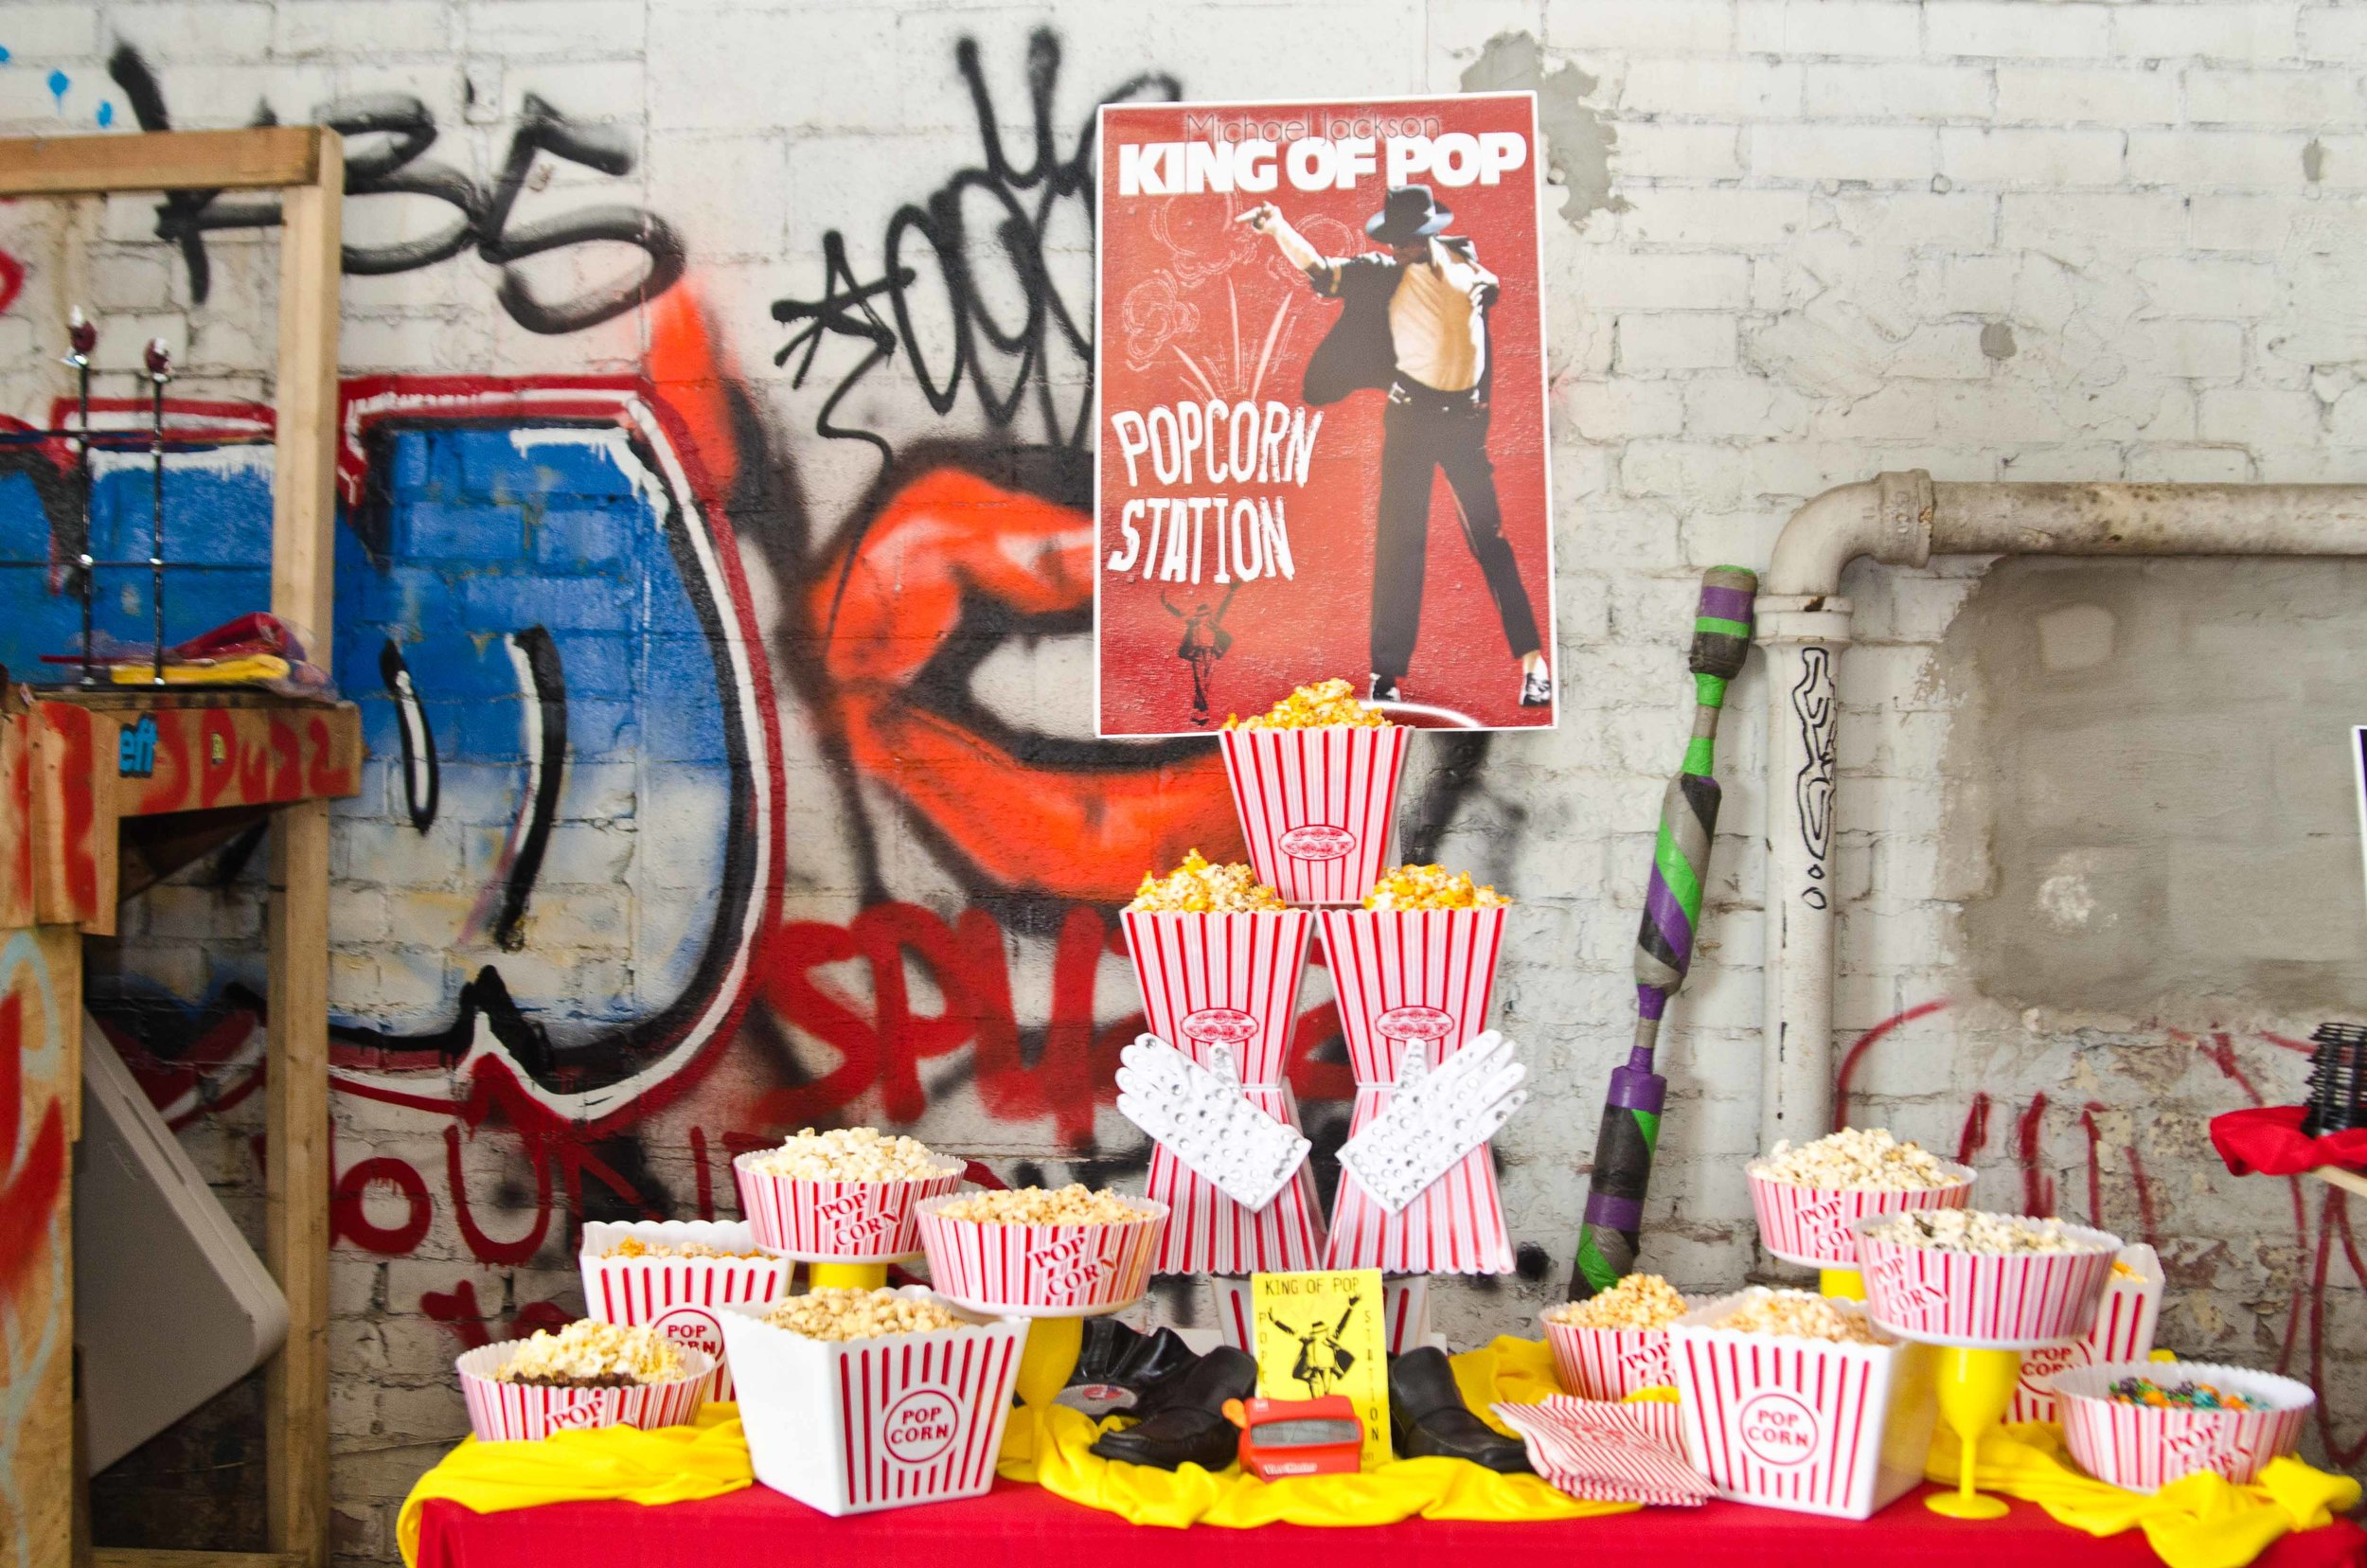 Michael Jackson popcorn station